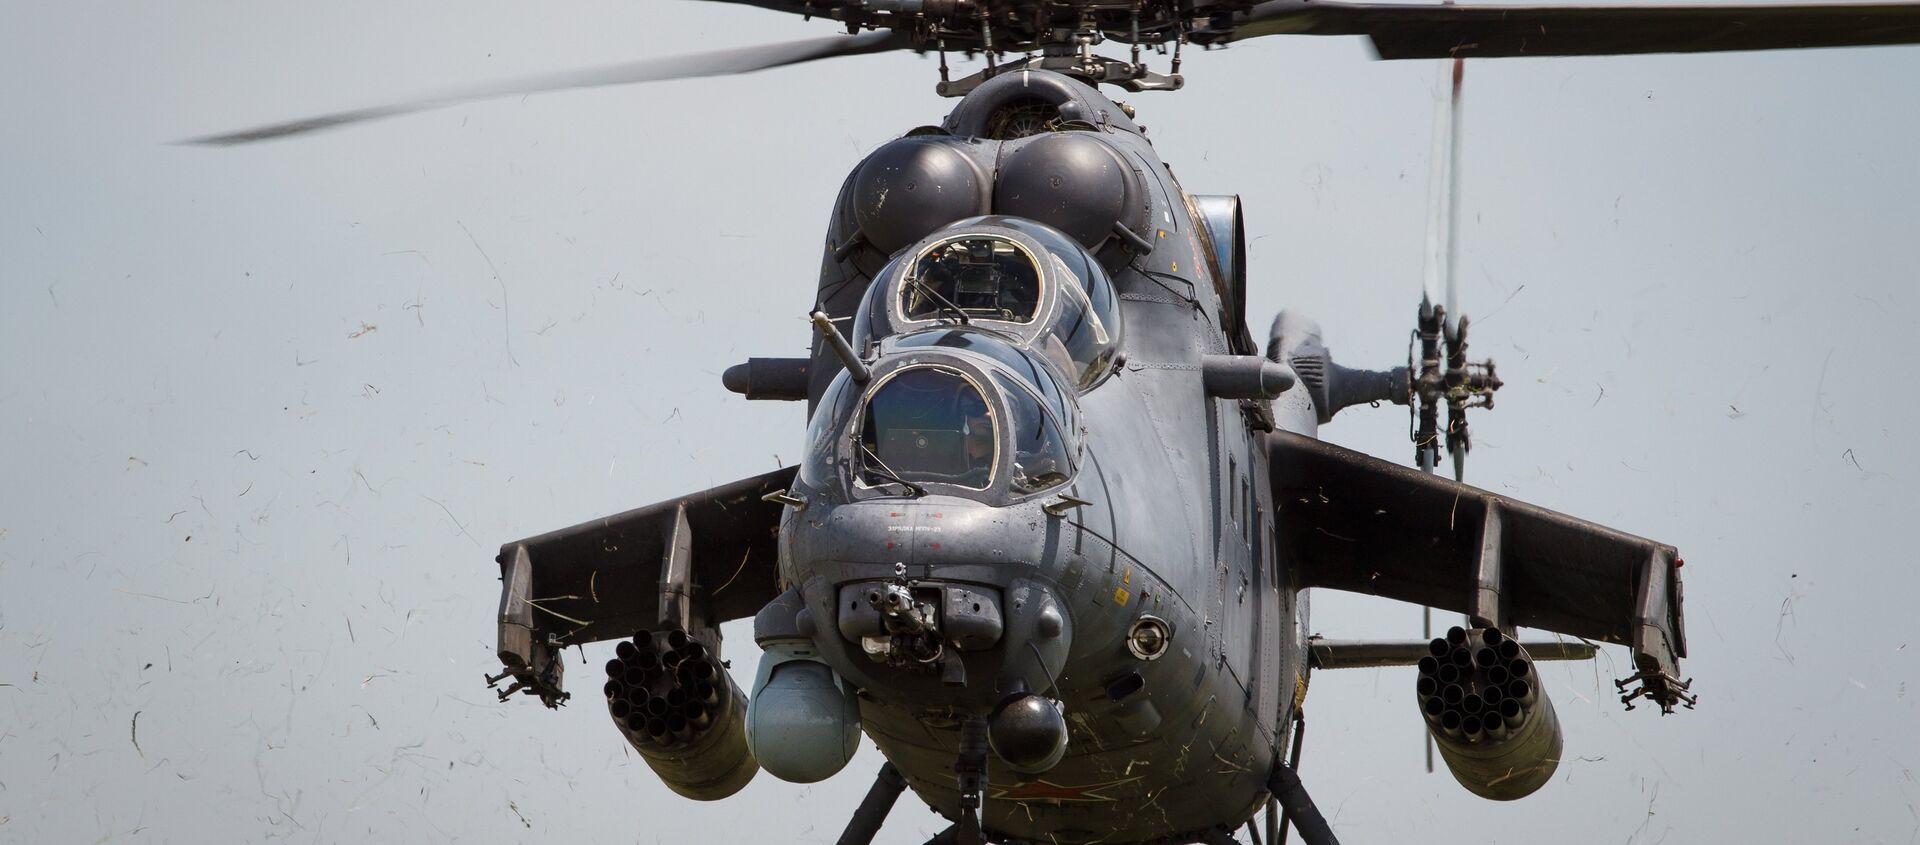 Mi-35M helicopters on training flights in Krasnodar Territory - Sputnik Mundo, 1920, 24.12.2020